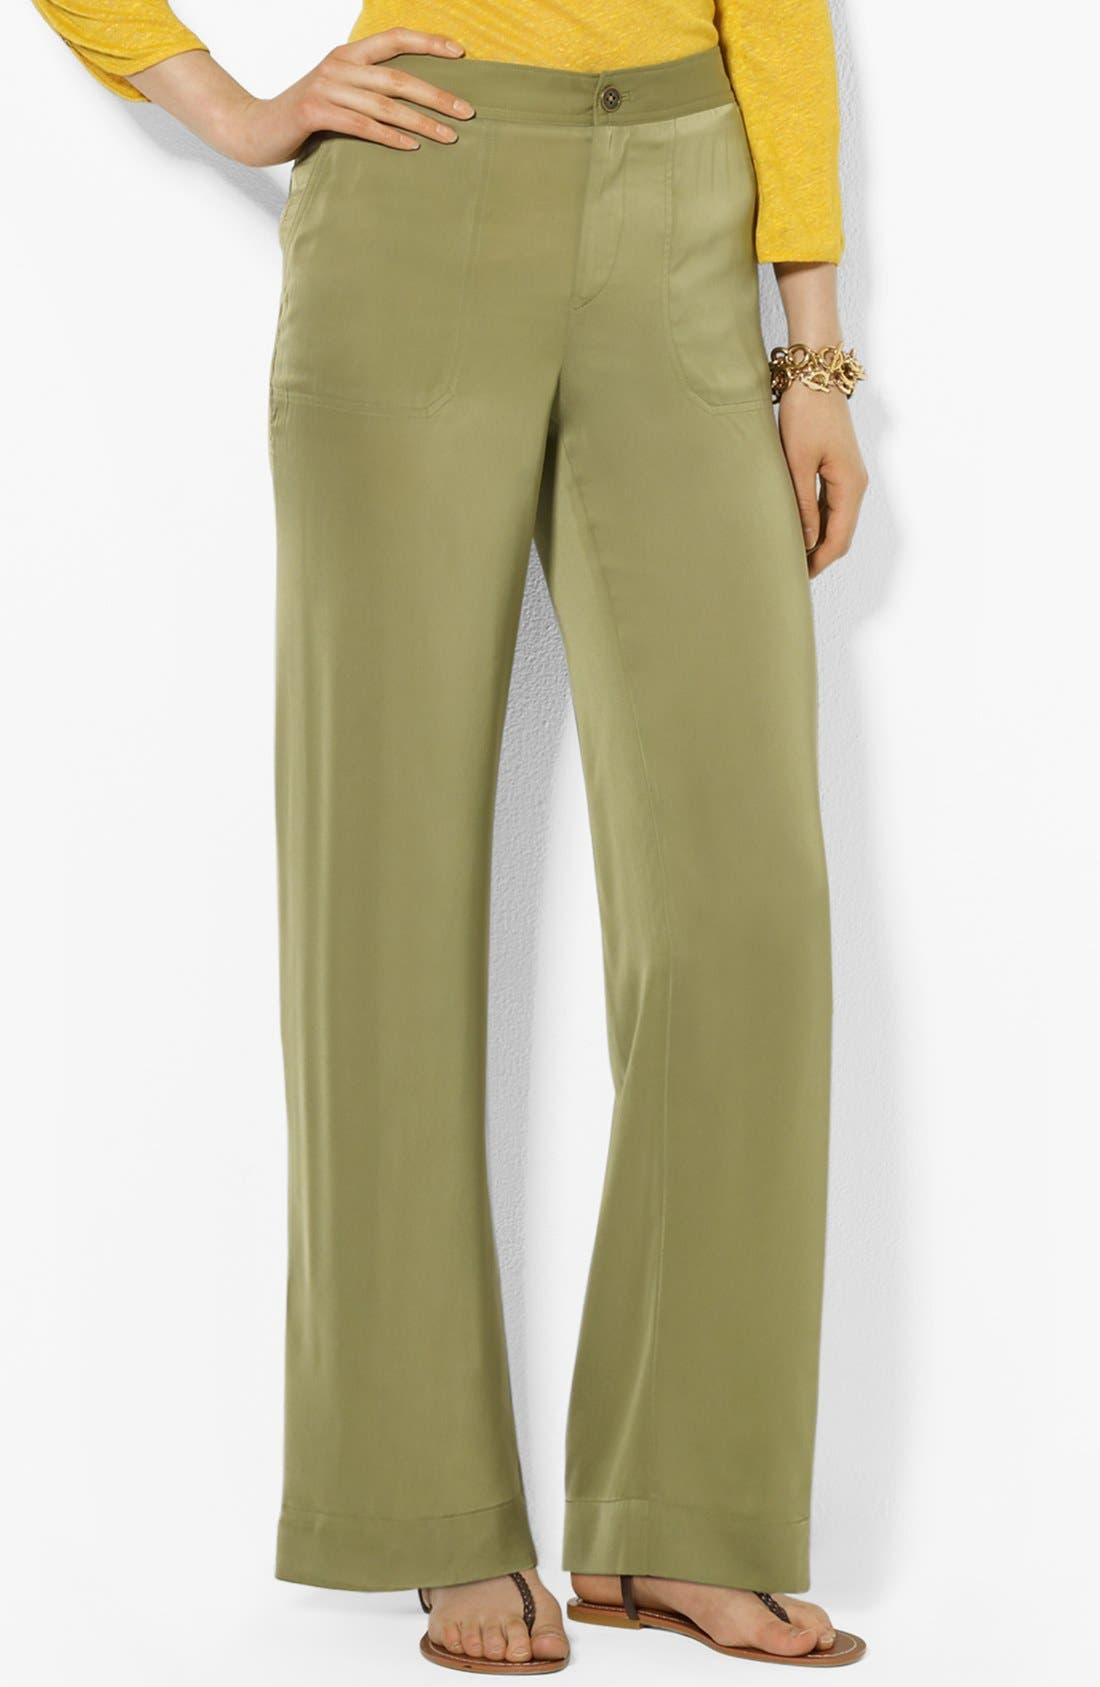 Alternate Image 1 Selected - Lauren Ralph Lauren Wide Leg Pants (Petite)